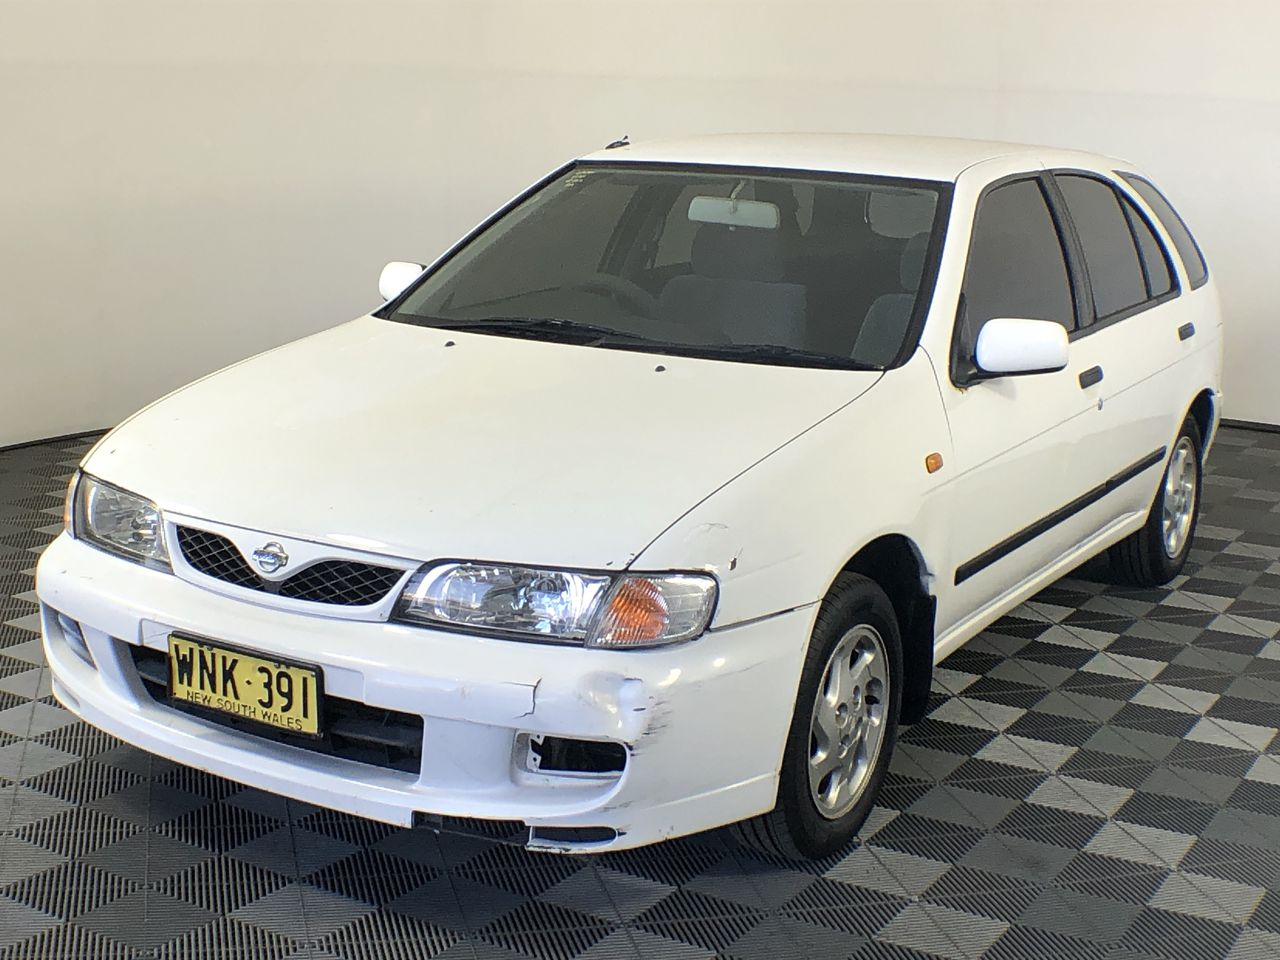 2000 Nissan Pulsar LX N15 Automatic Hatchback